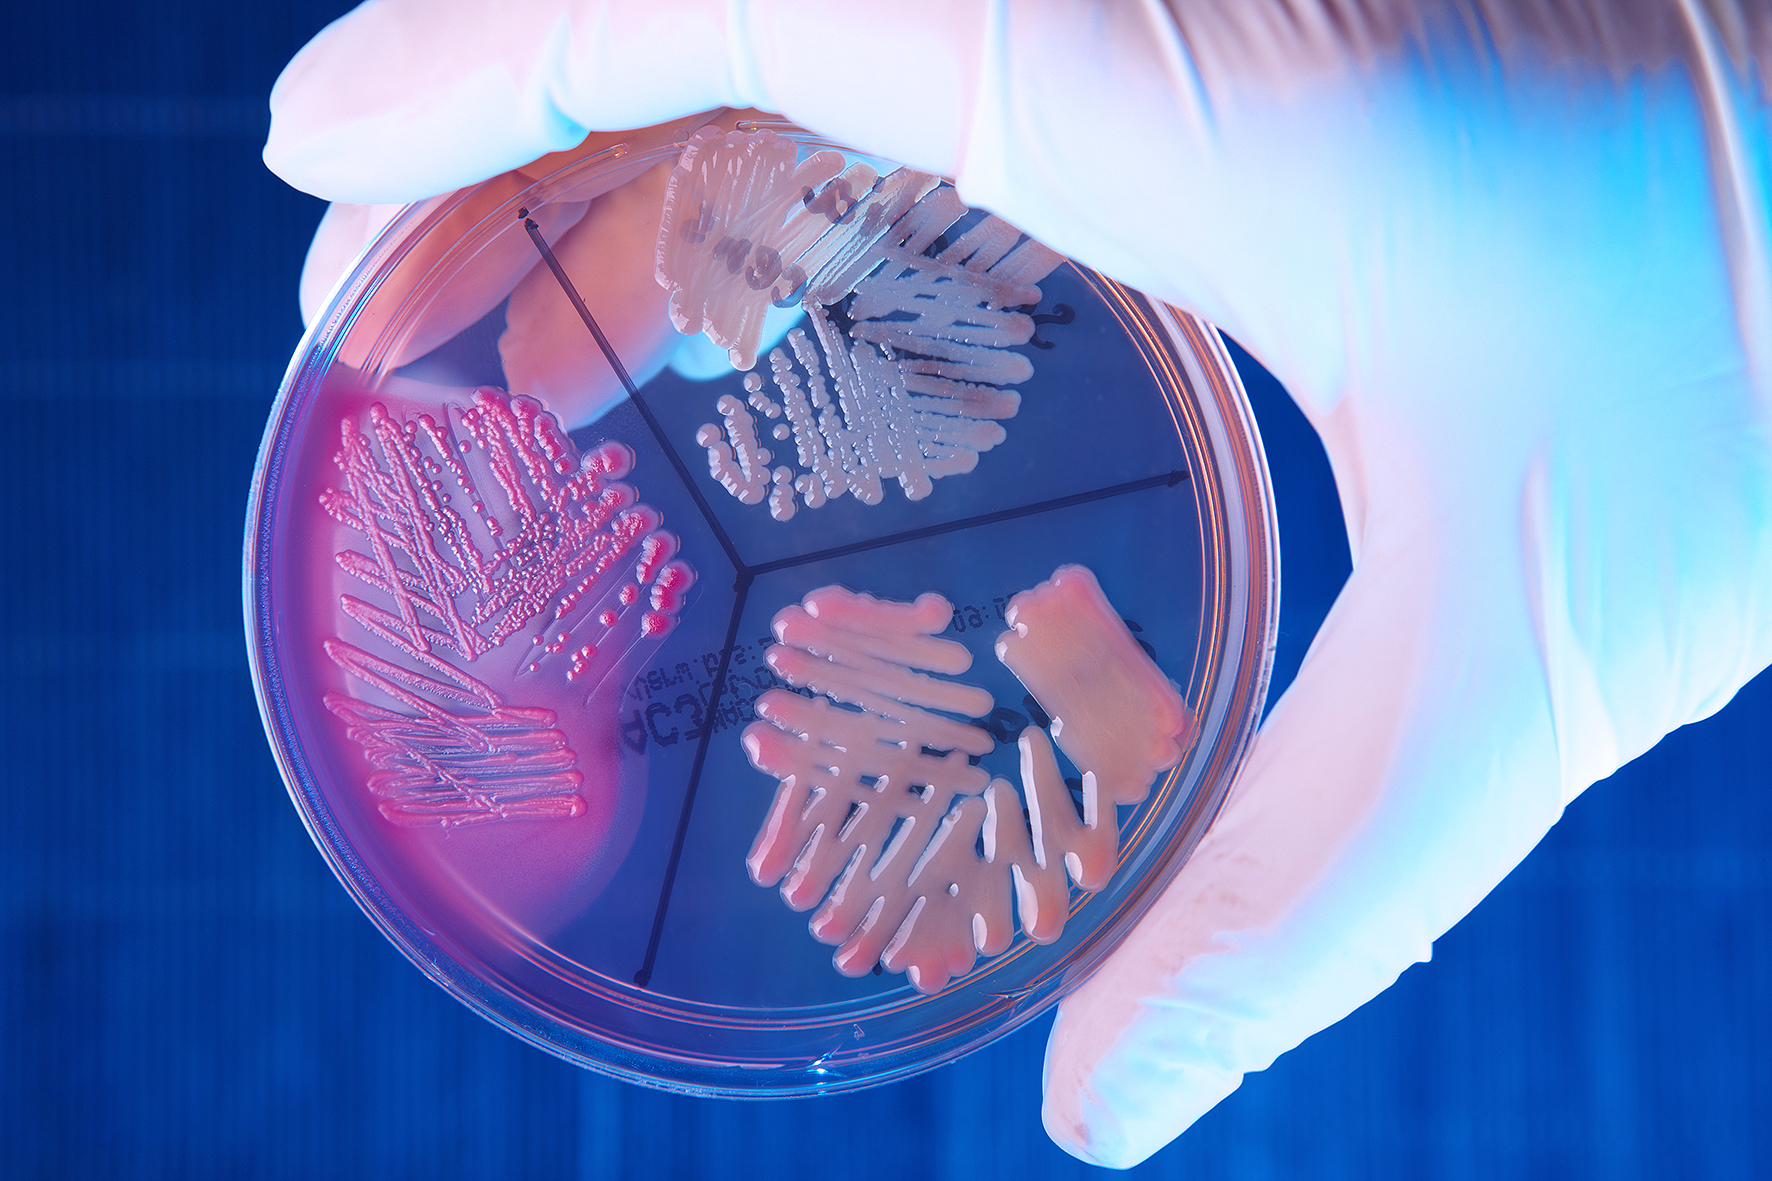 Что такое Enterobacter agglomerans?